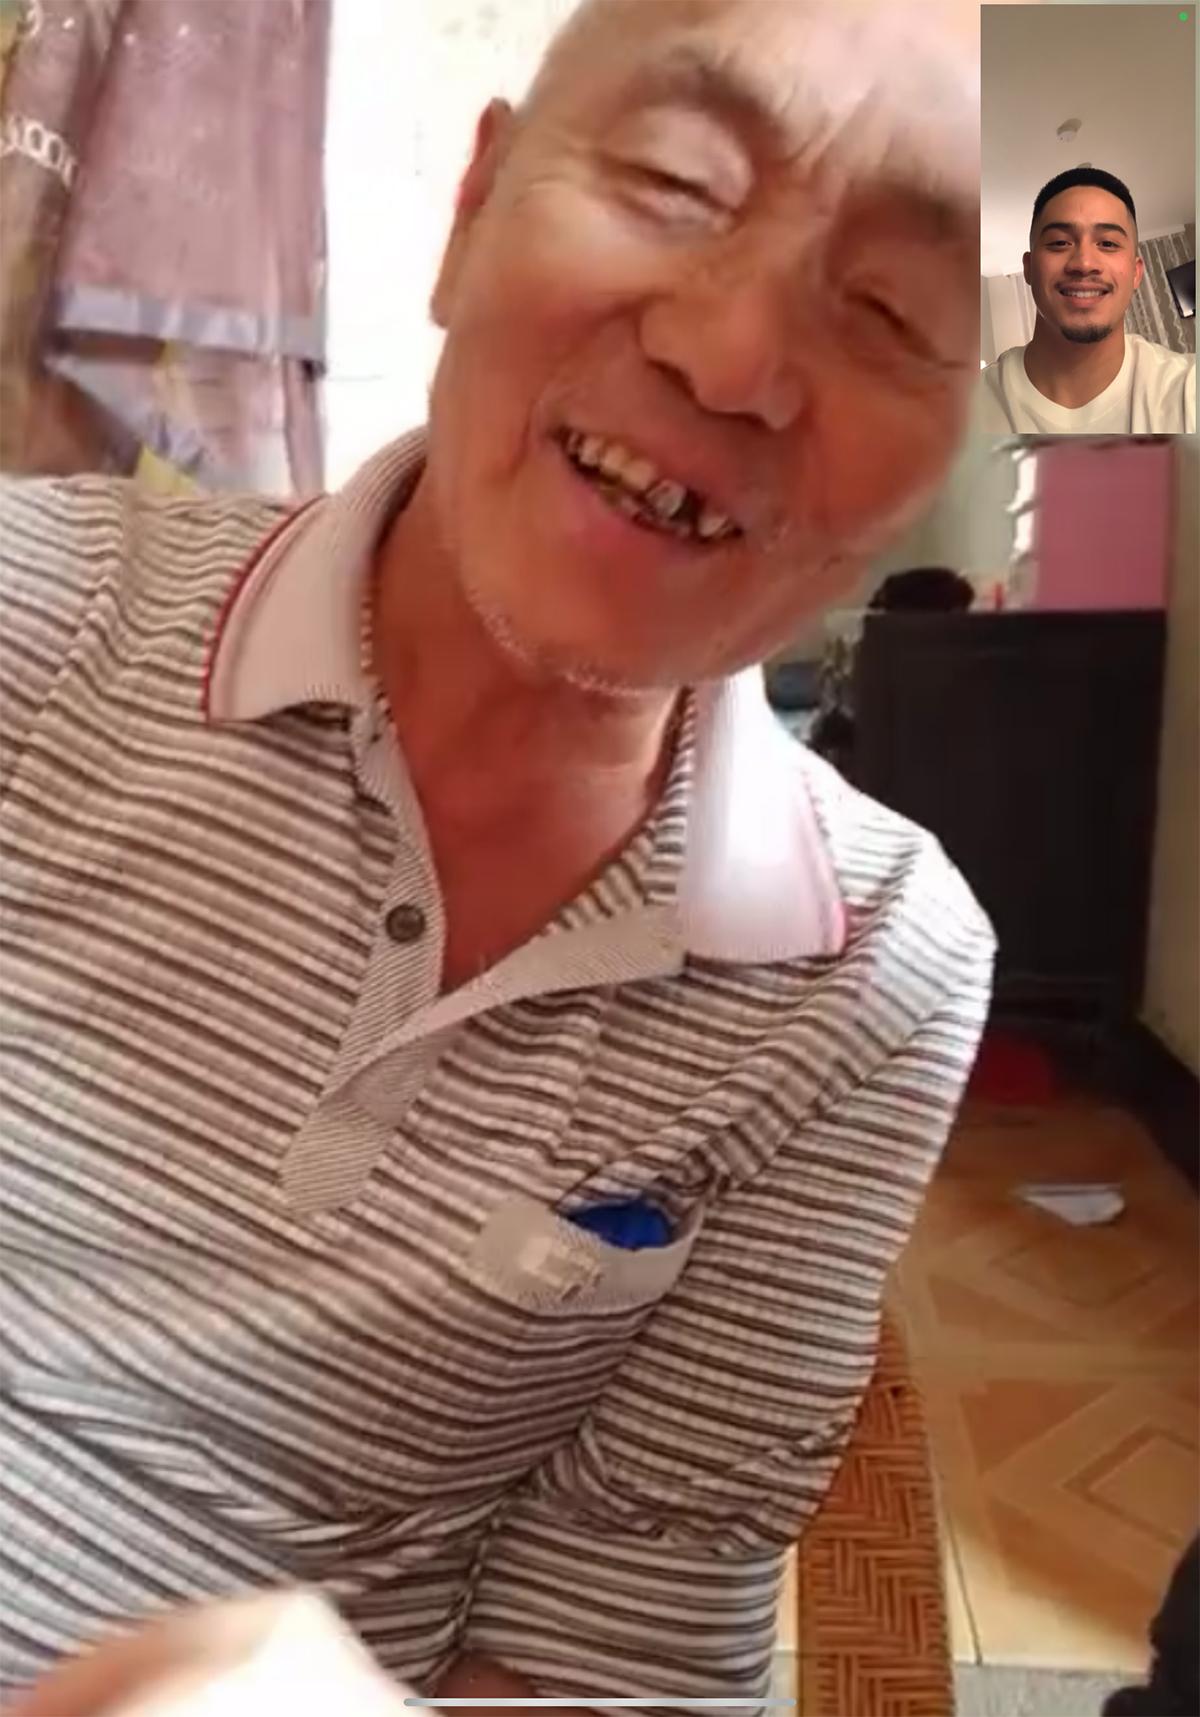 Screenshot of smiling elderly Chinese man meeting young Filipino Chinese man on FaceTime